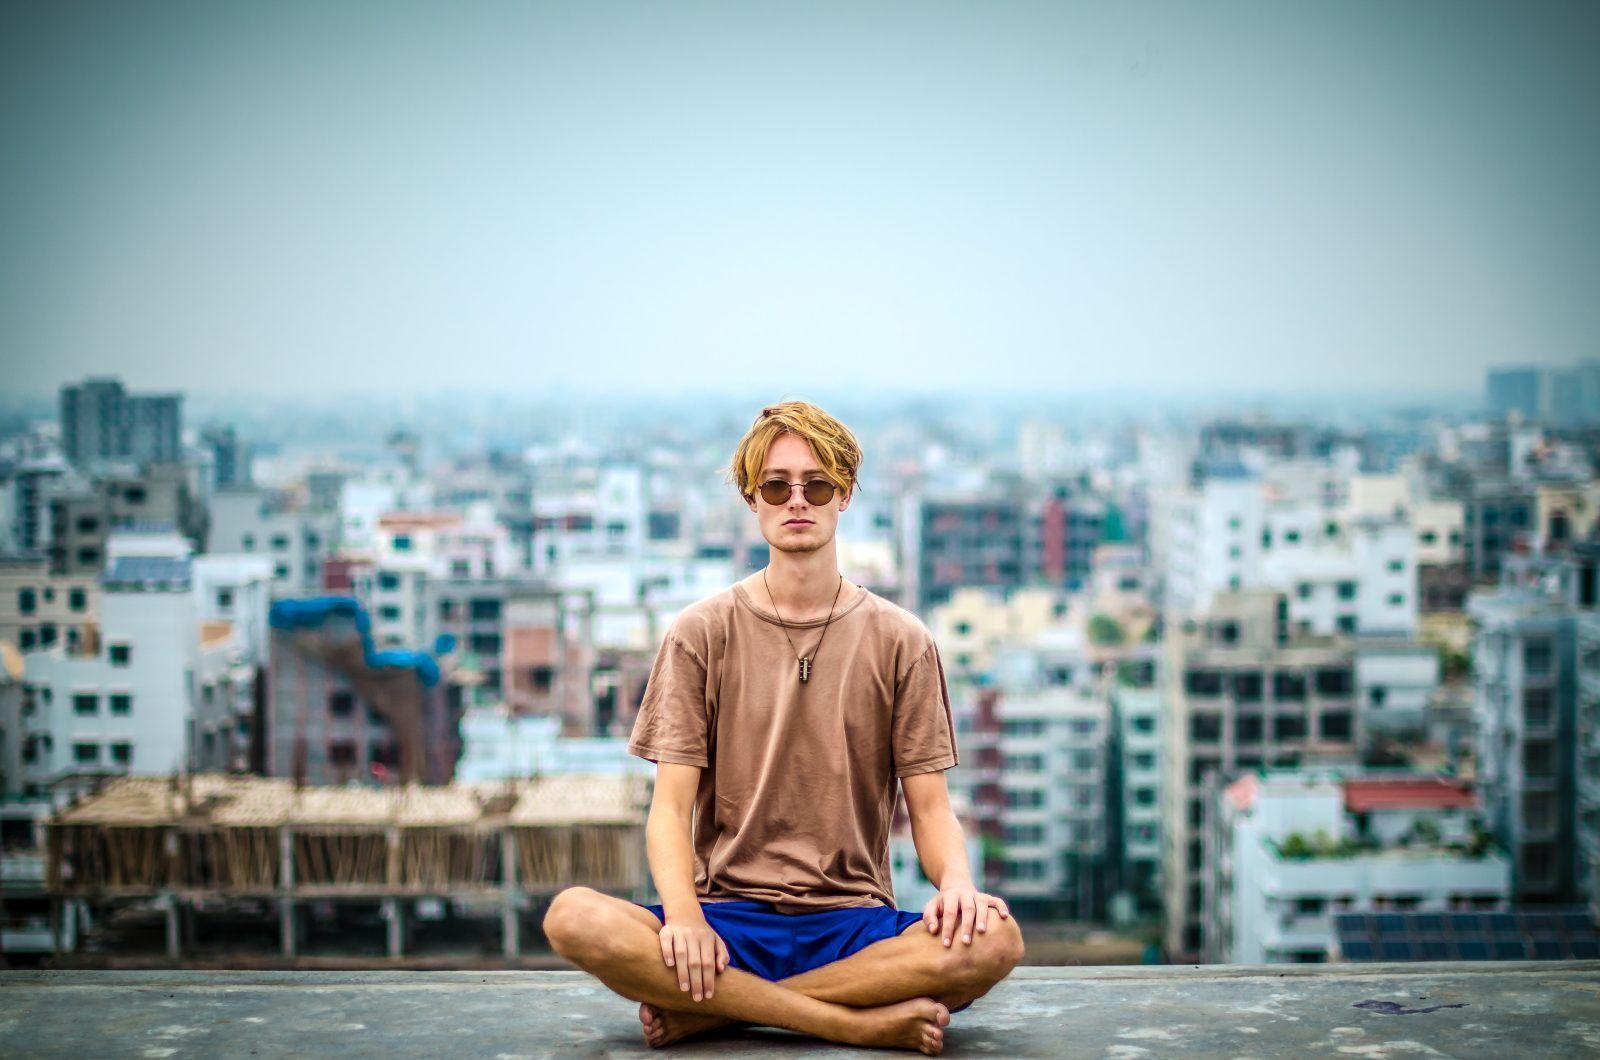 meditatierenden haltung